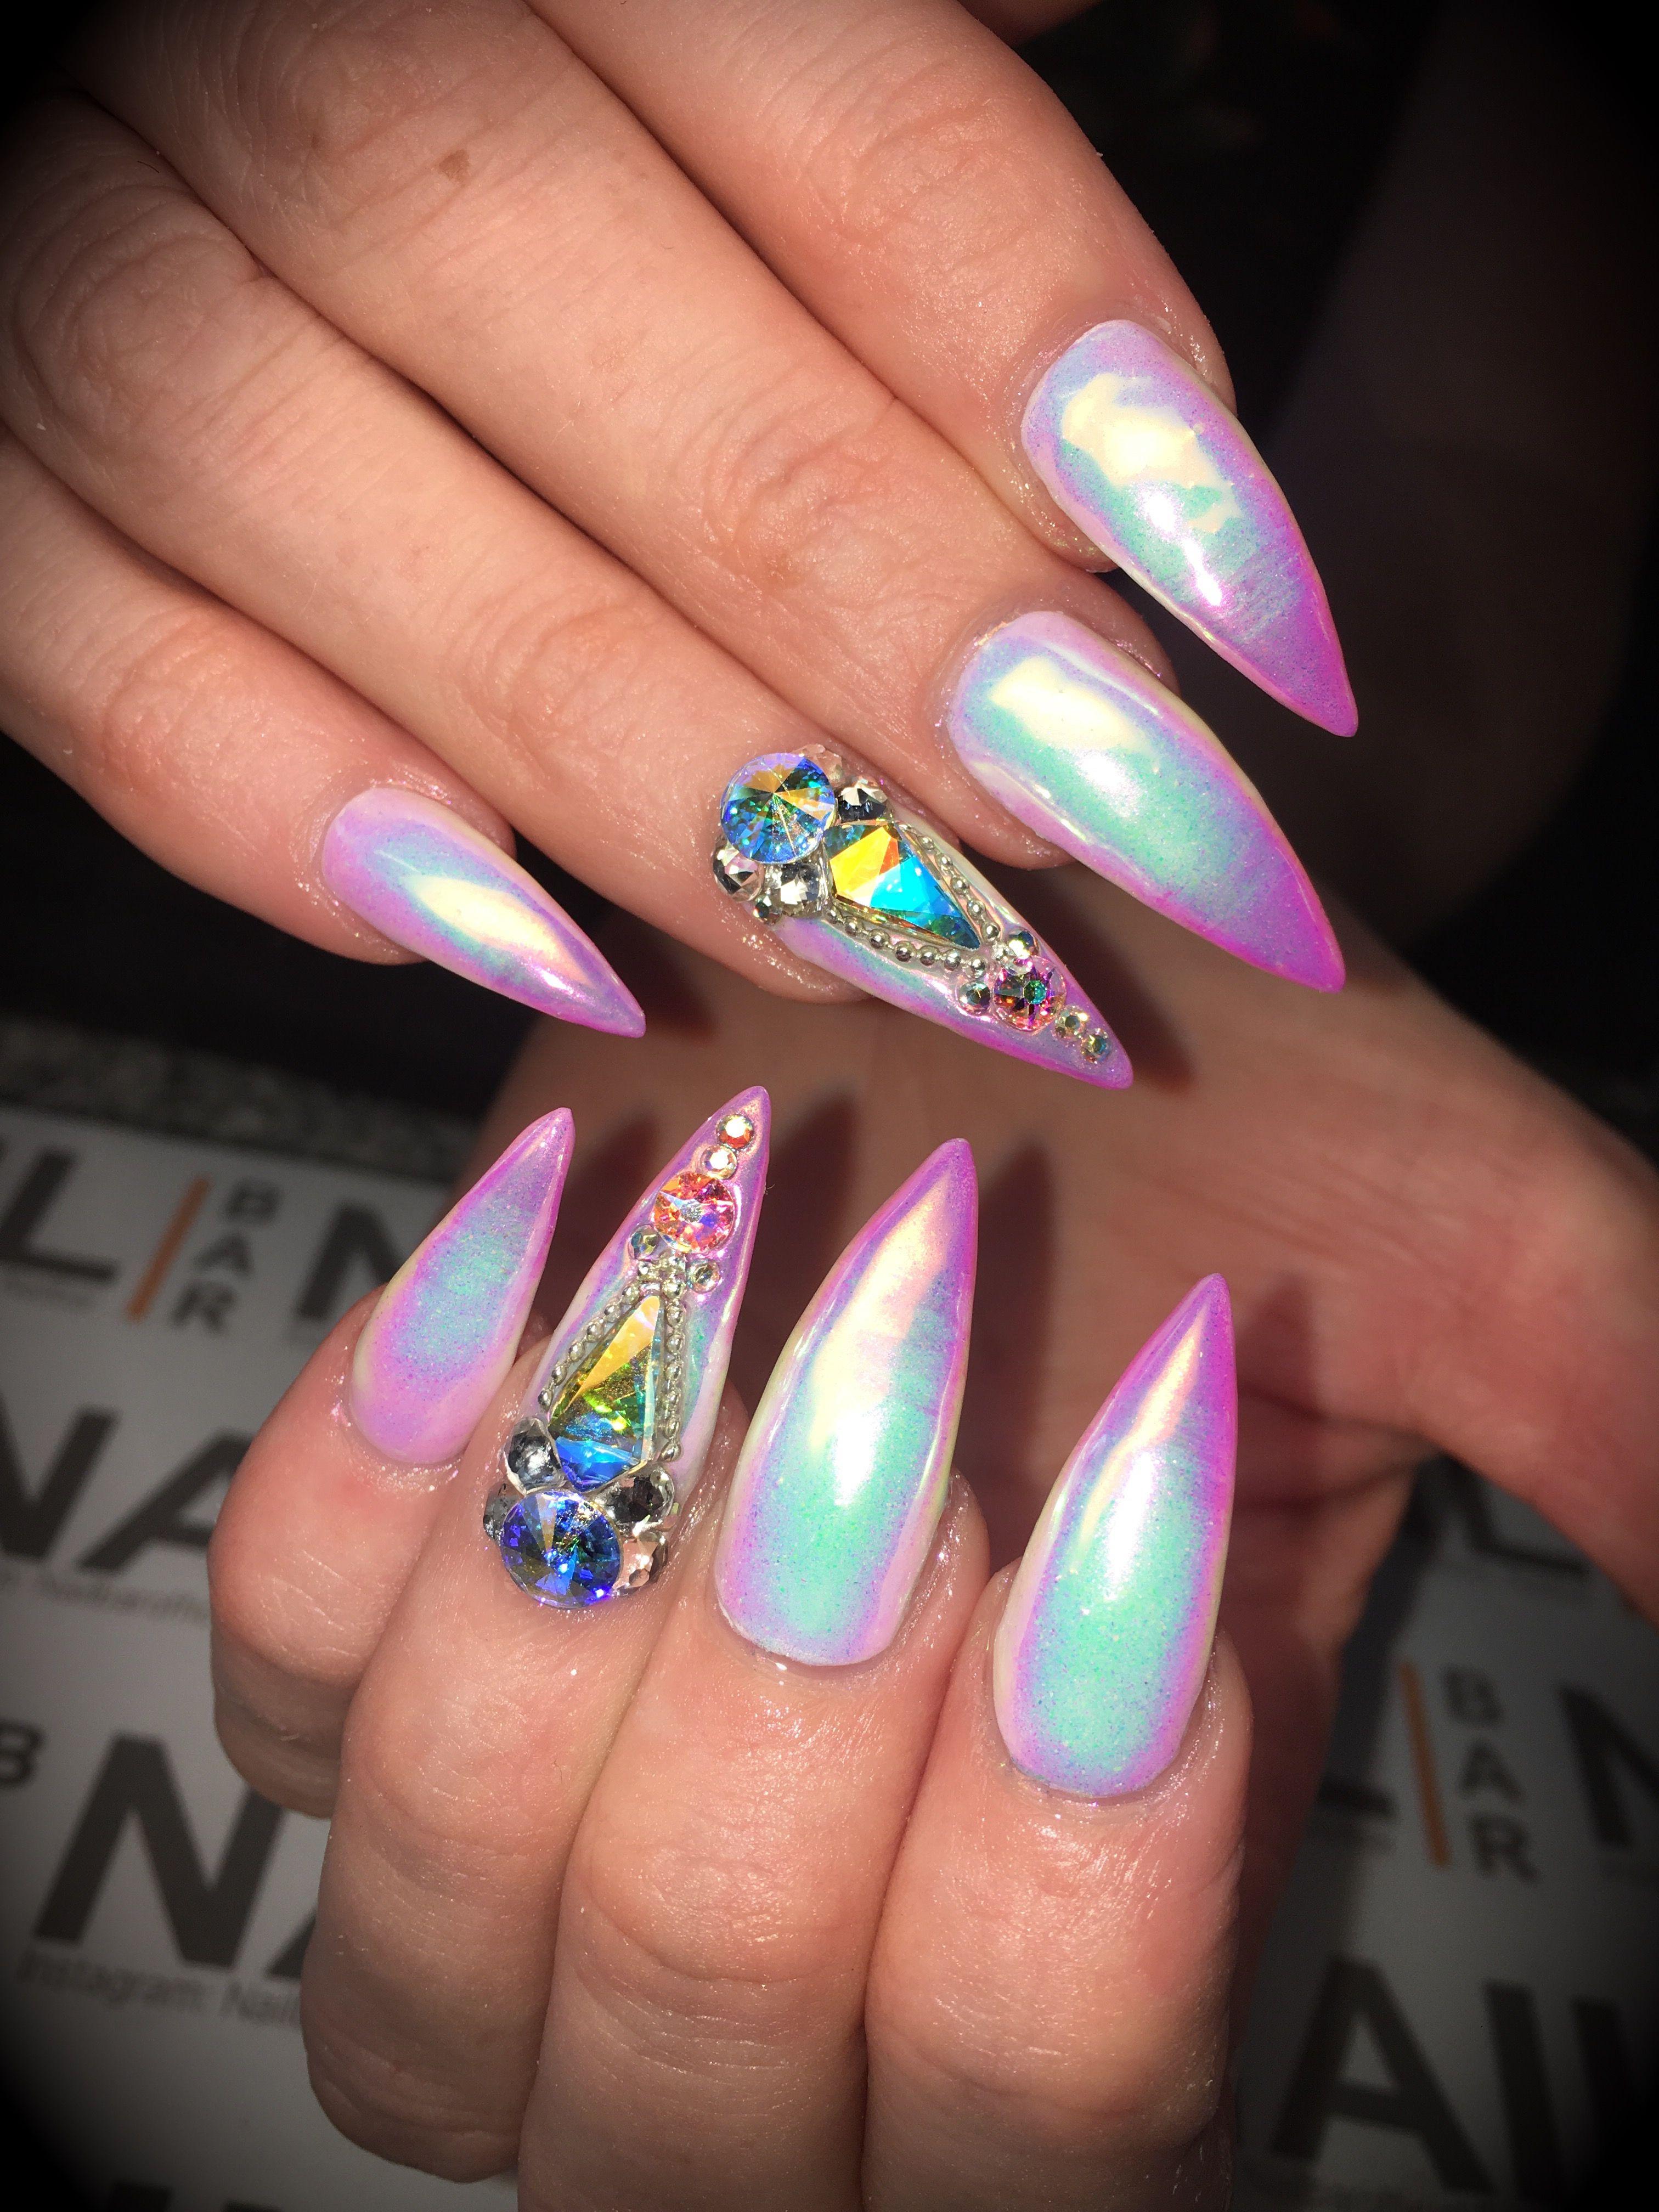 Pin by ilovedarren23 hes my husband on Nails | Pinterest | Nail nail ...